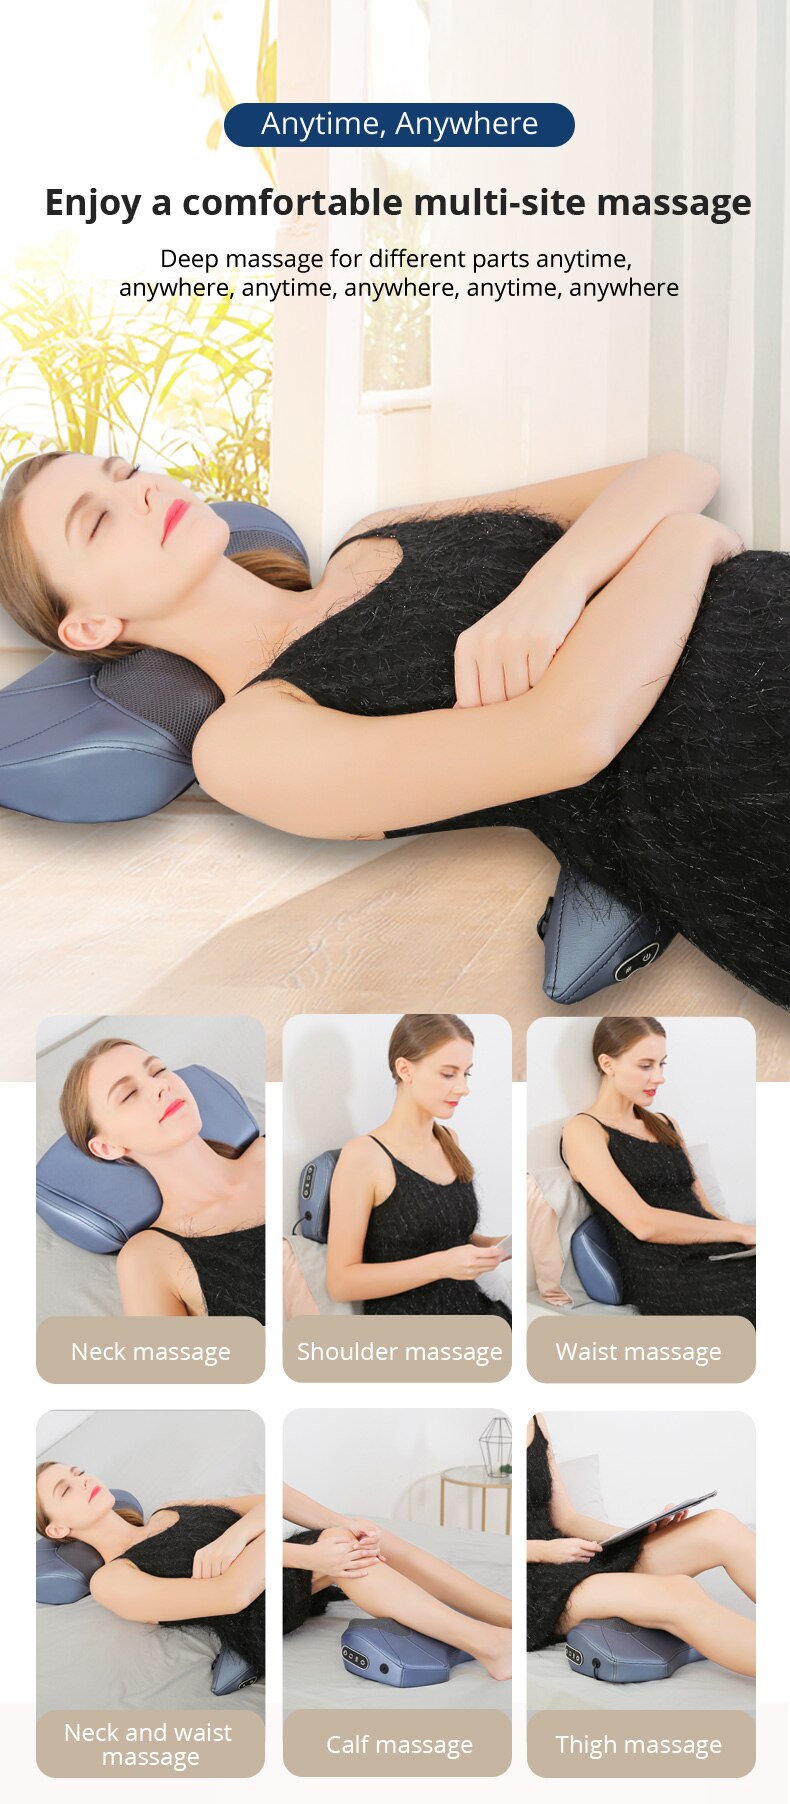 KLASVSA Intelligent combination massage pillow Neck massage Back massage Waist massage Bluetooth music Artificial broadcast